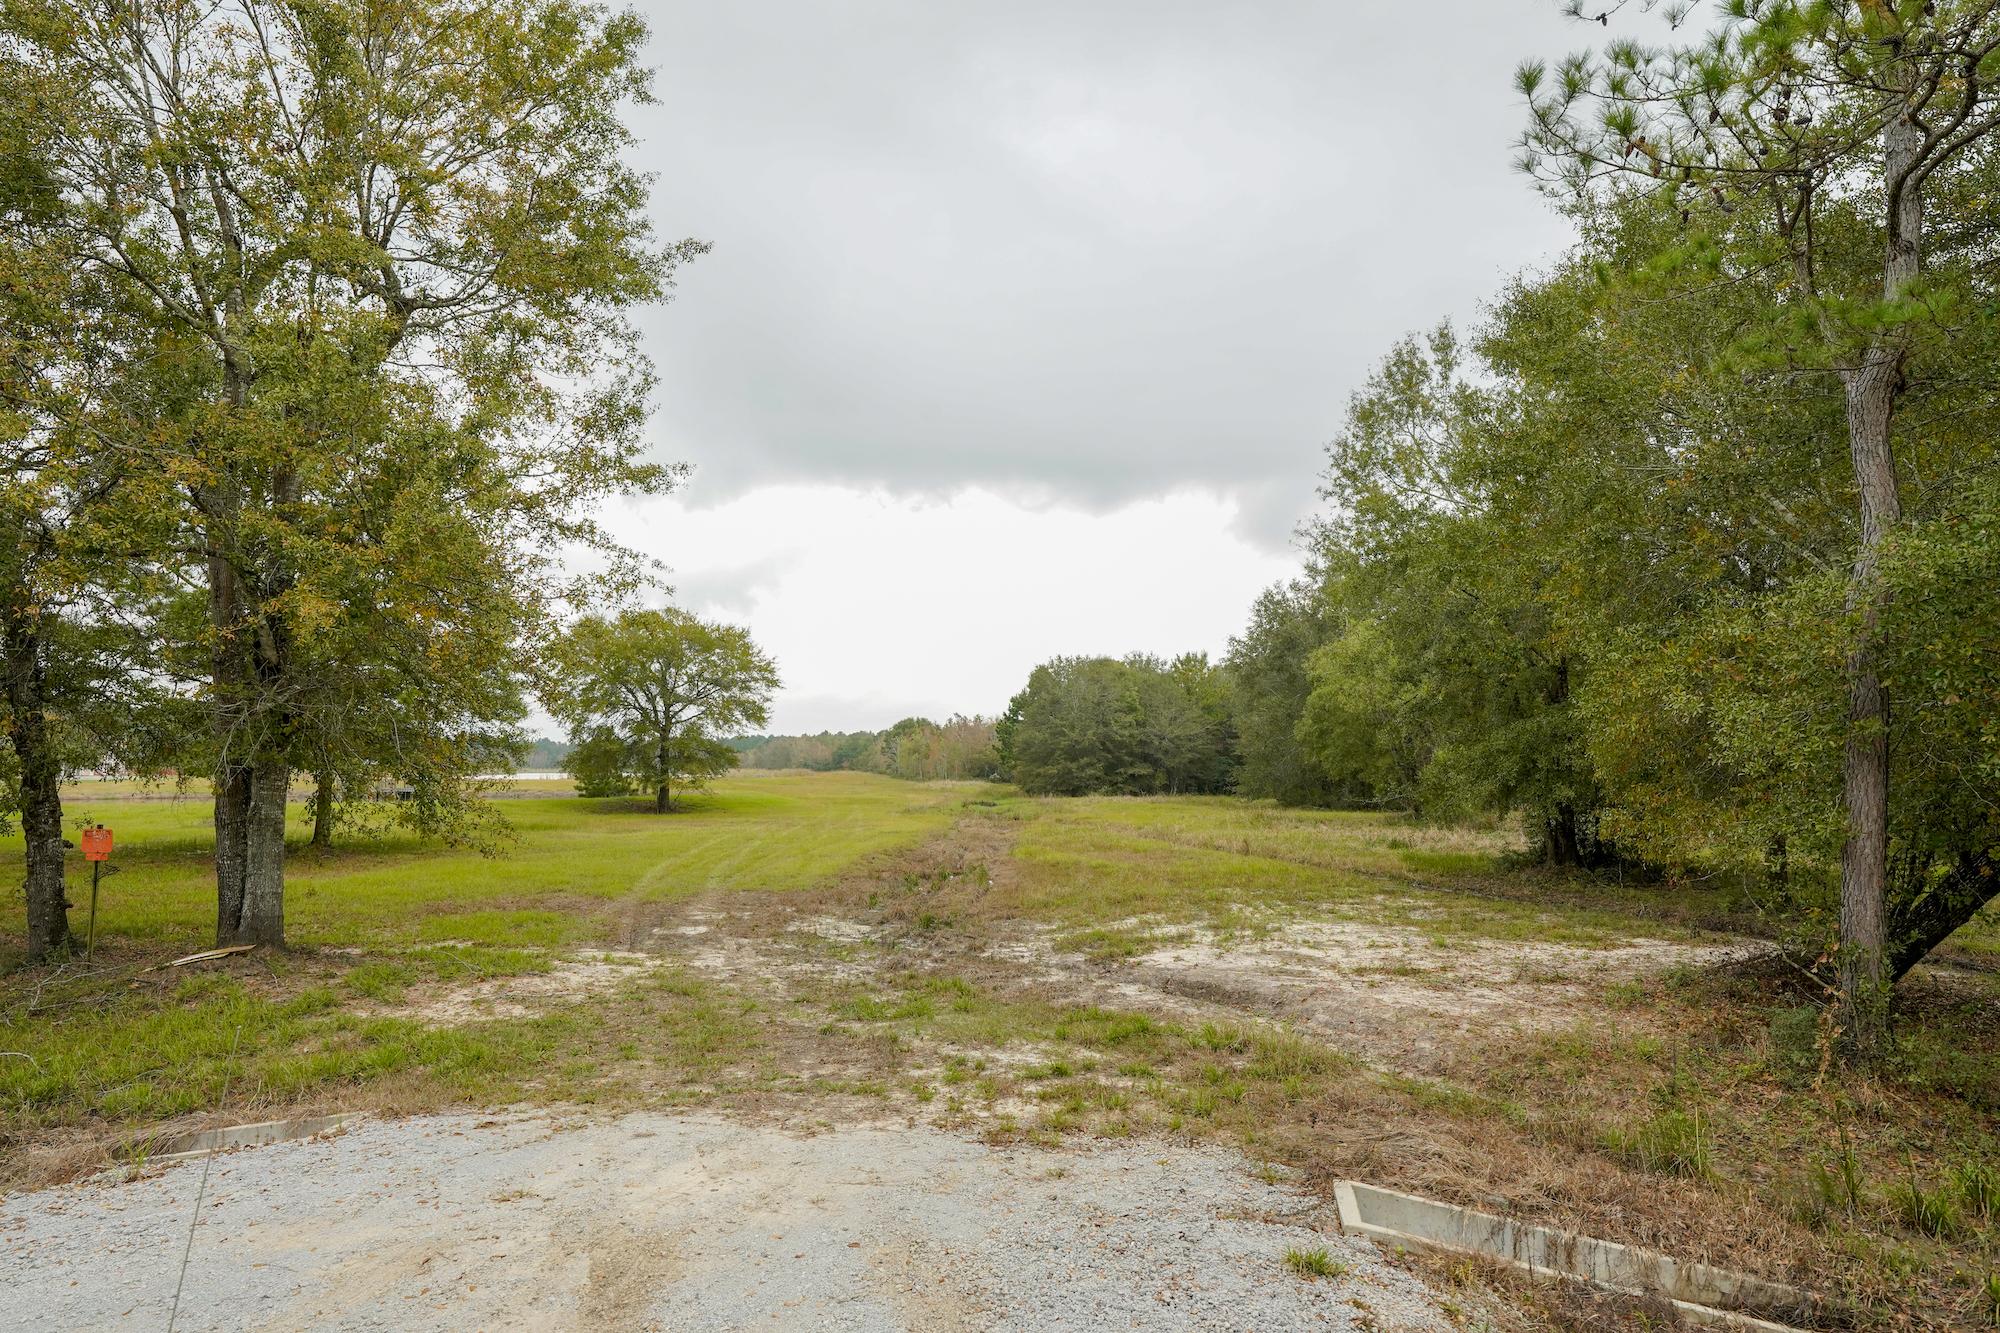 Jefferson County Development Land - Image 26 of 36